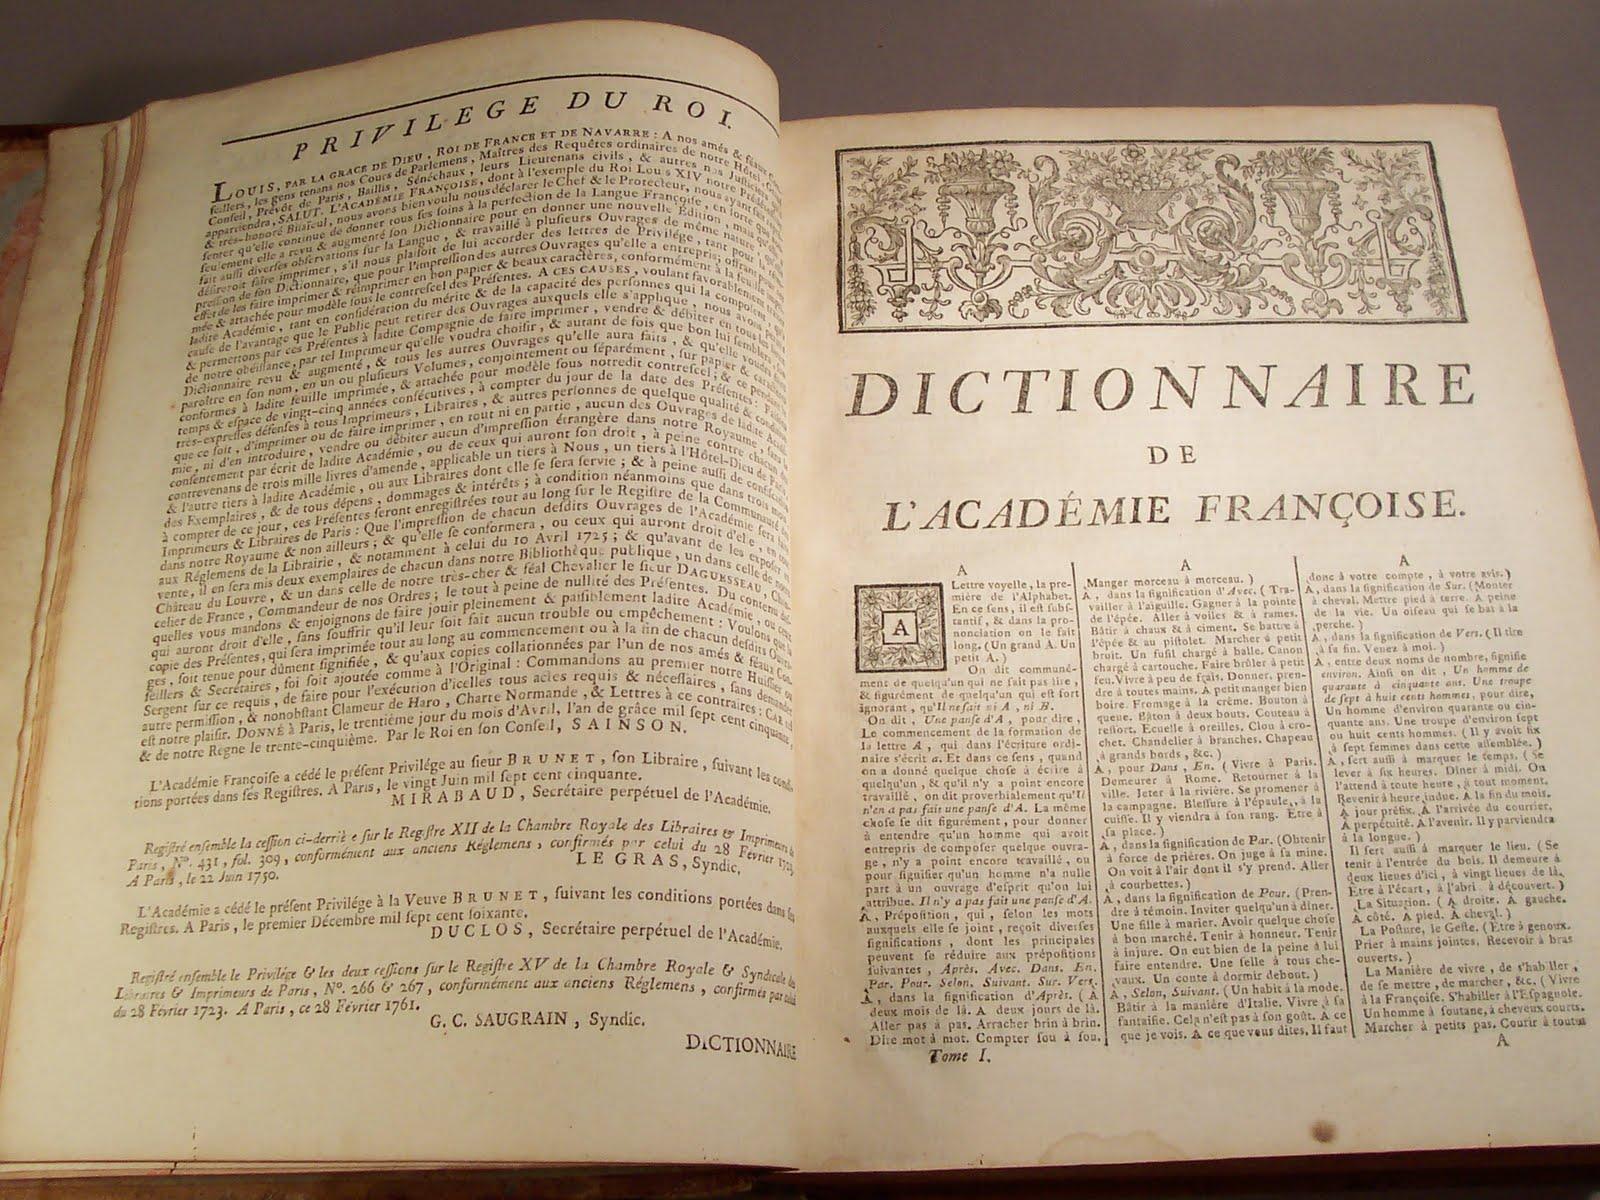 http://3.bp.blogspot.com/-BtPNgu5U6Eo/TaRp6Zija3I/AAAAAAAAF6A/Pniq8Ji6clE/s1600/dictionnaire%2Bacademie%2B4%2B007.jpg